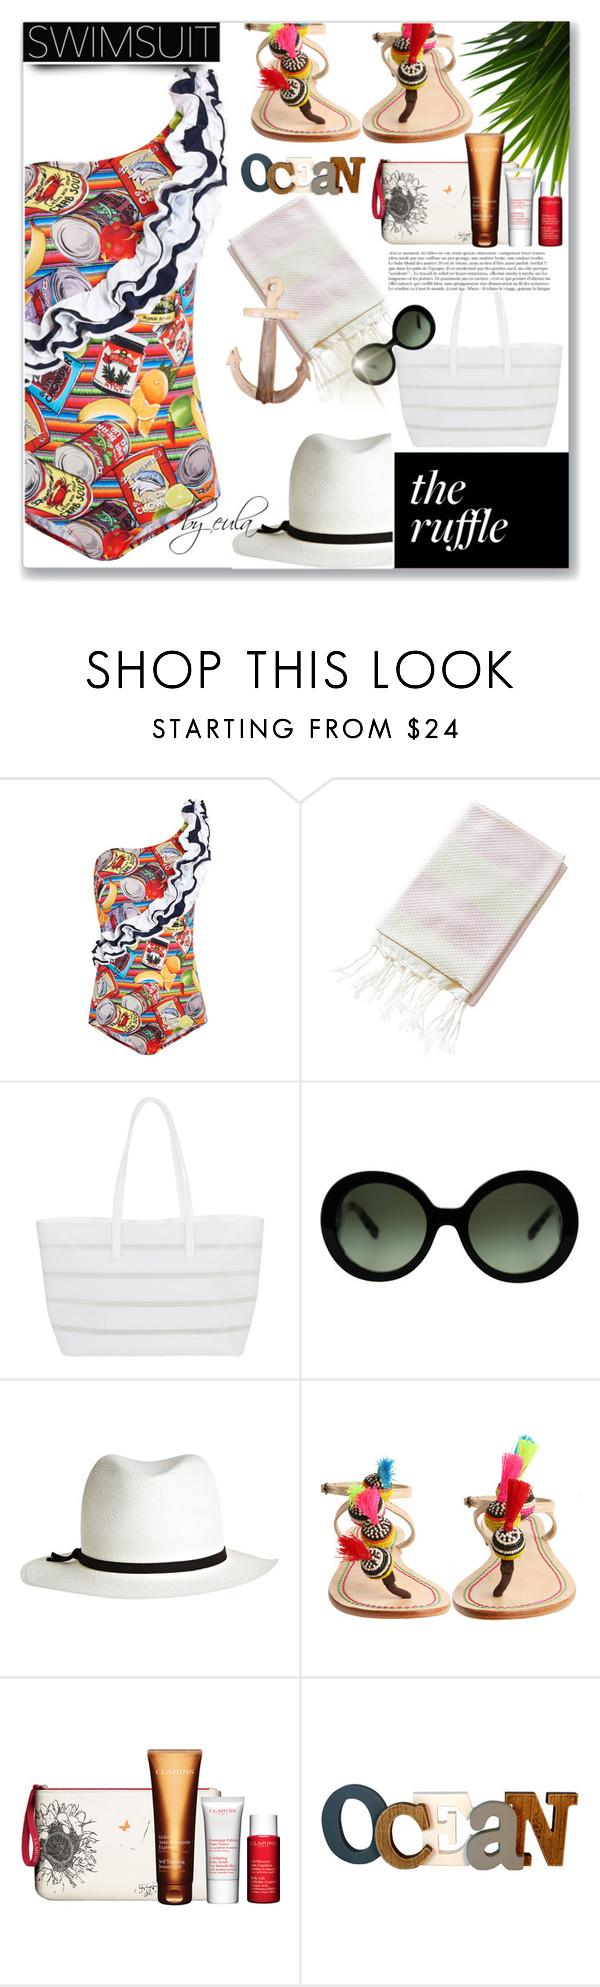 """Ruffled Up Swimwear"" by eula-eldridge-tolliver ❤ liked on Polyvore featuring Stella Jean, BUCO, Anja, Prada, Calypso Private Label, Malìparmi and Clarins"